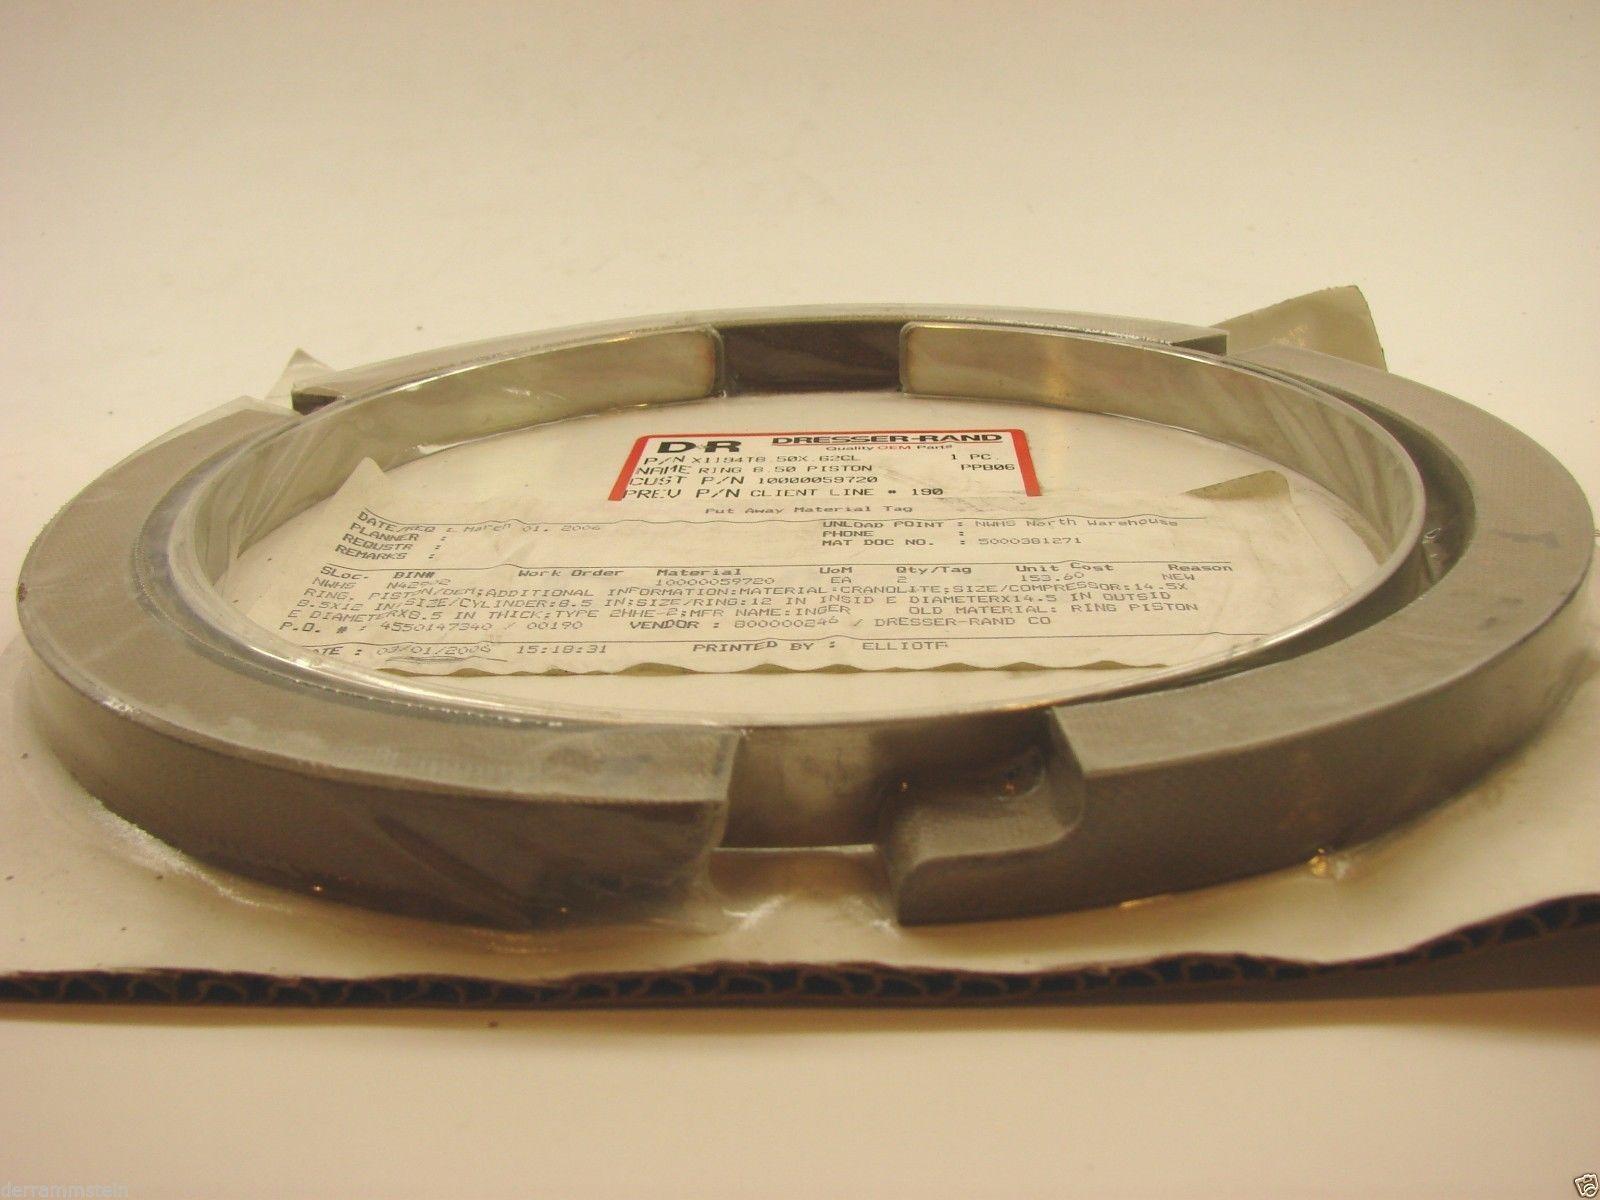 New (2) Dresser Rand X1194T 8.50 X .62CL  Piston Ring OEM Ring #1 & #2  b74